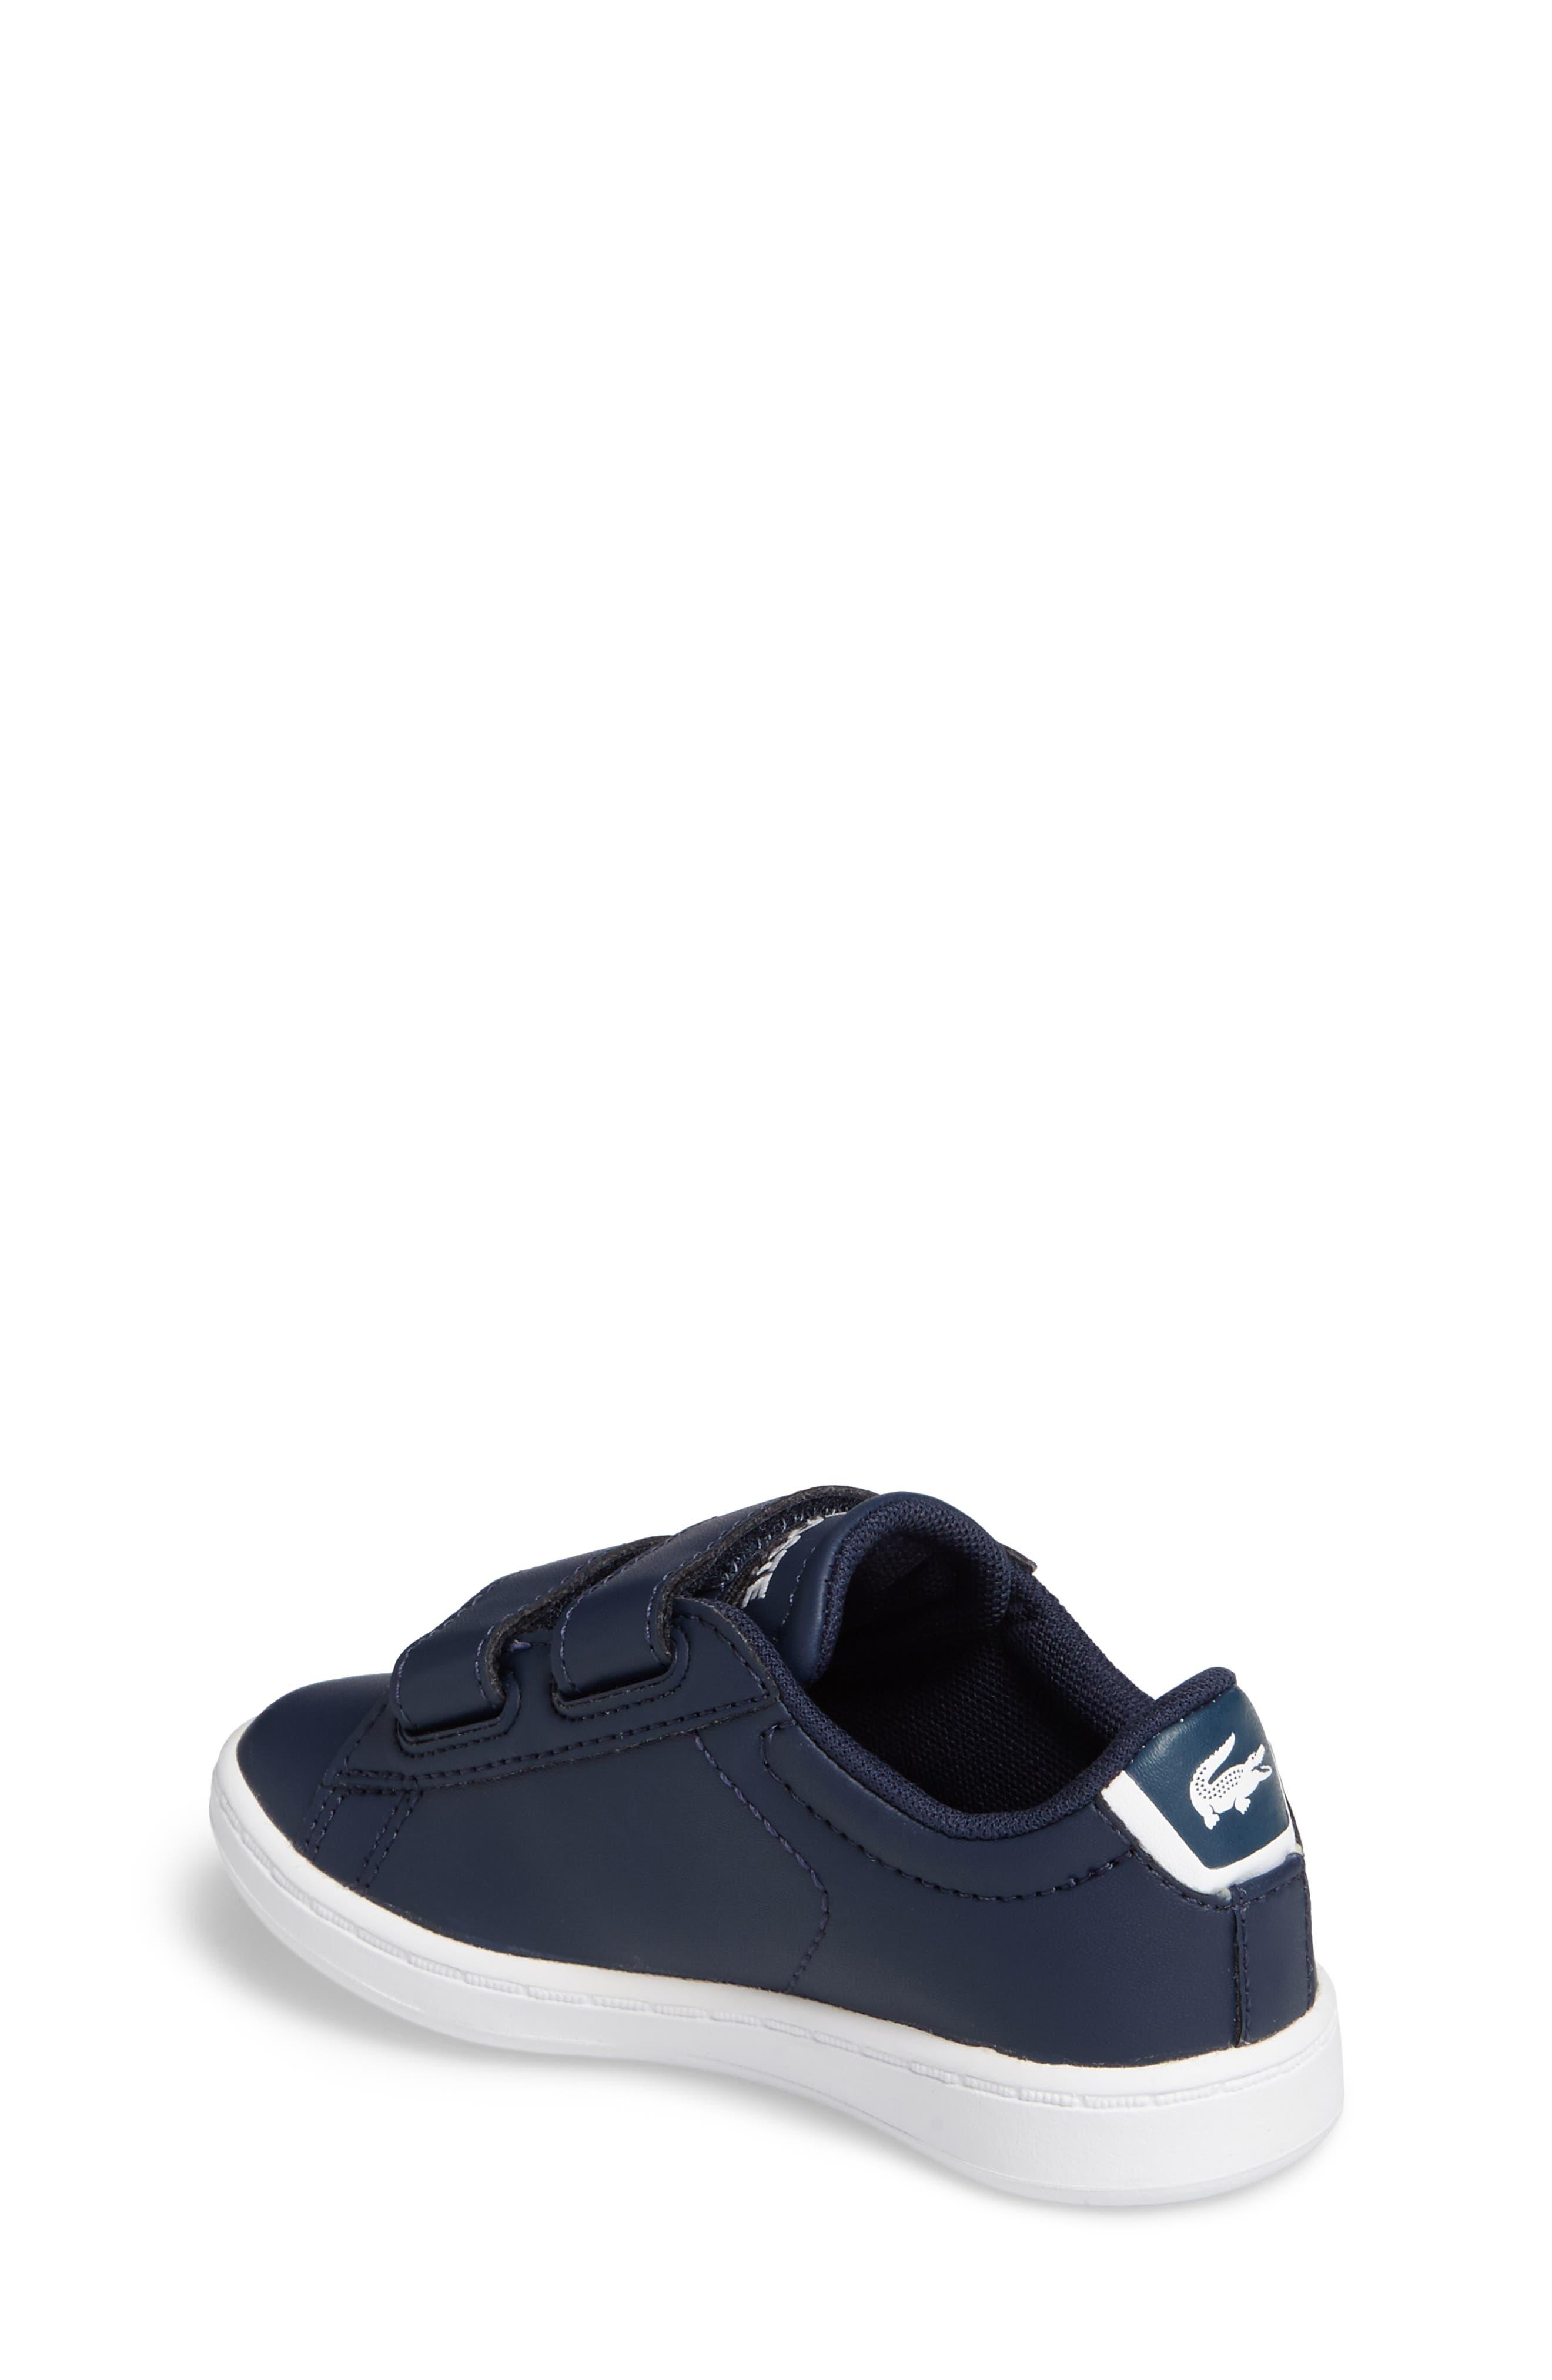 Carnaby Evo Sneaker,                             Alternate thumbnail 2, color,                             428